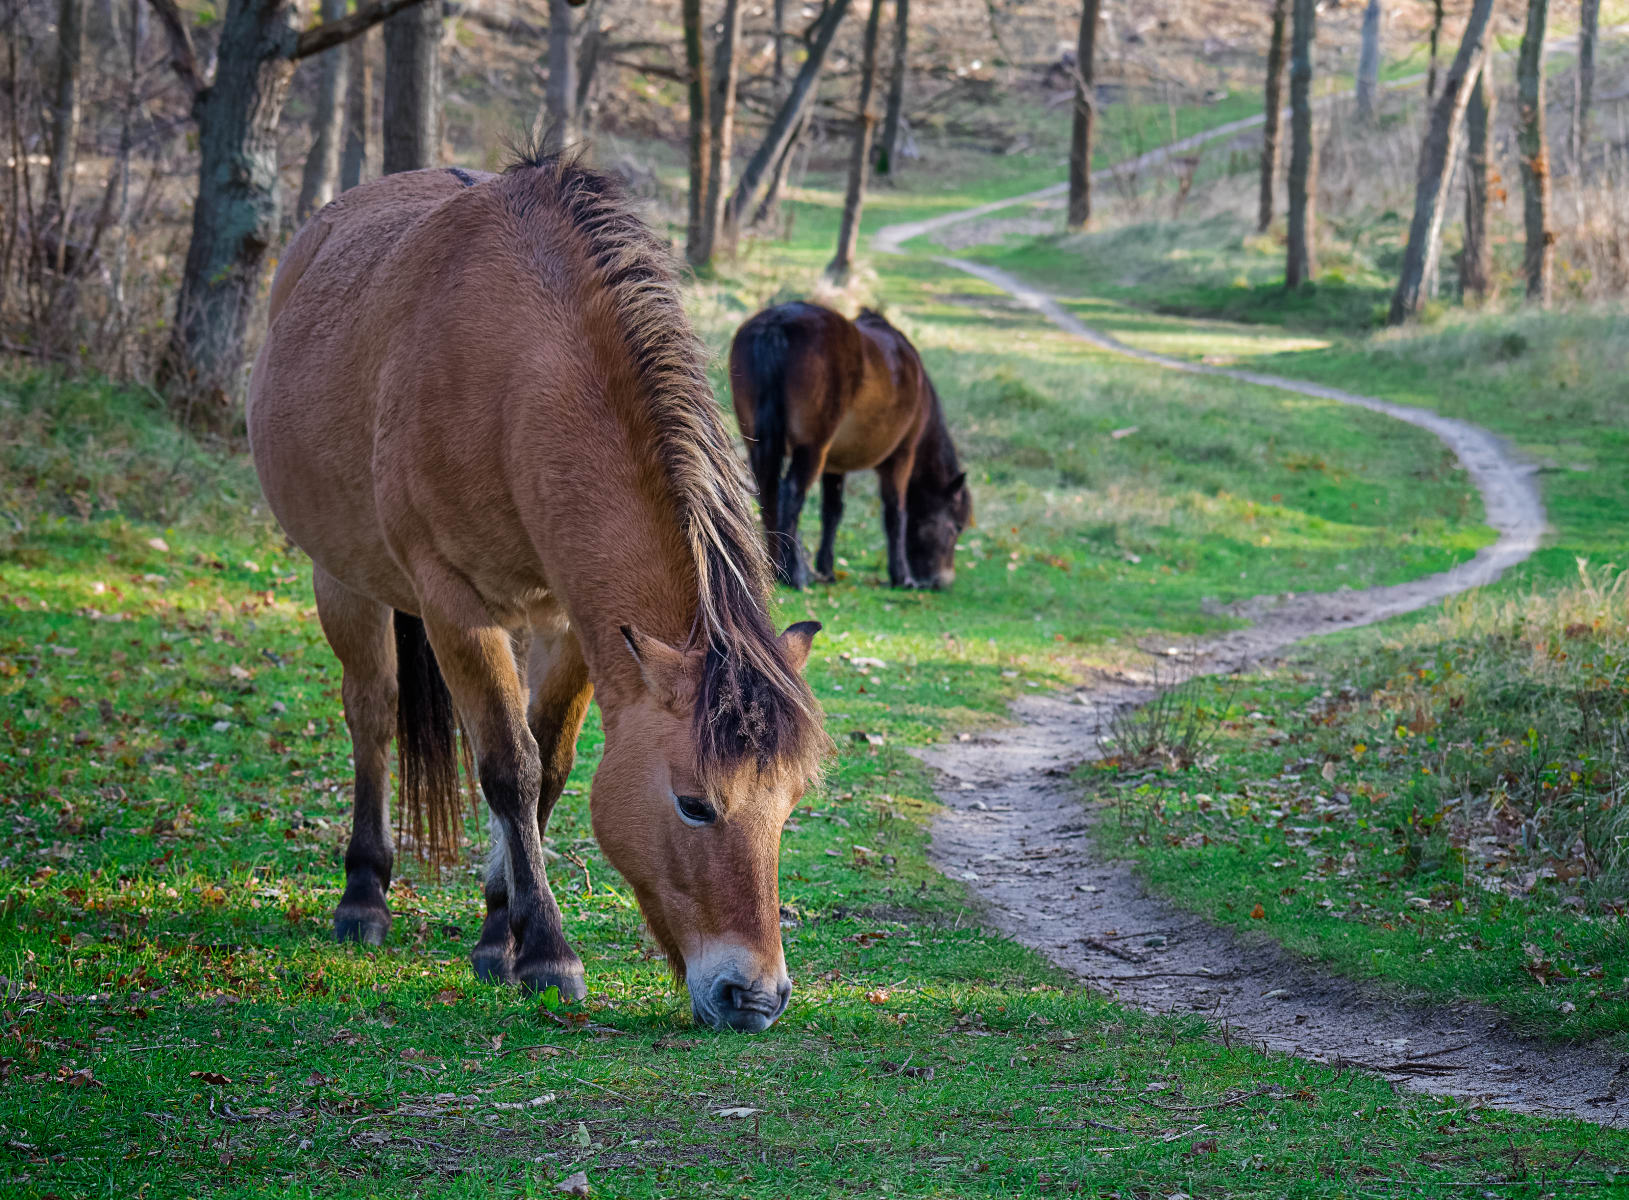 horses grazing along a winding path